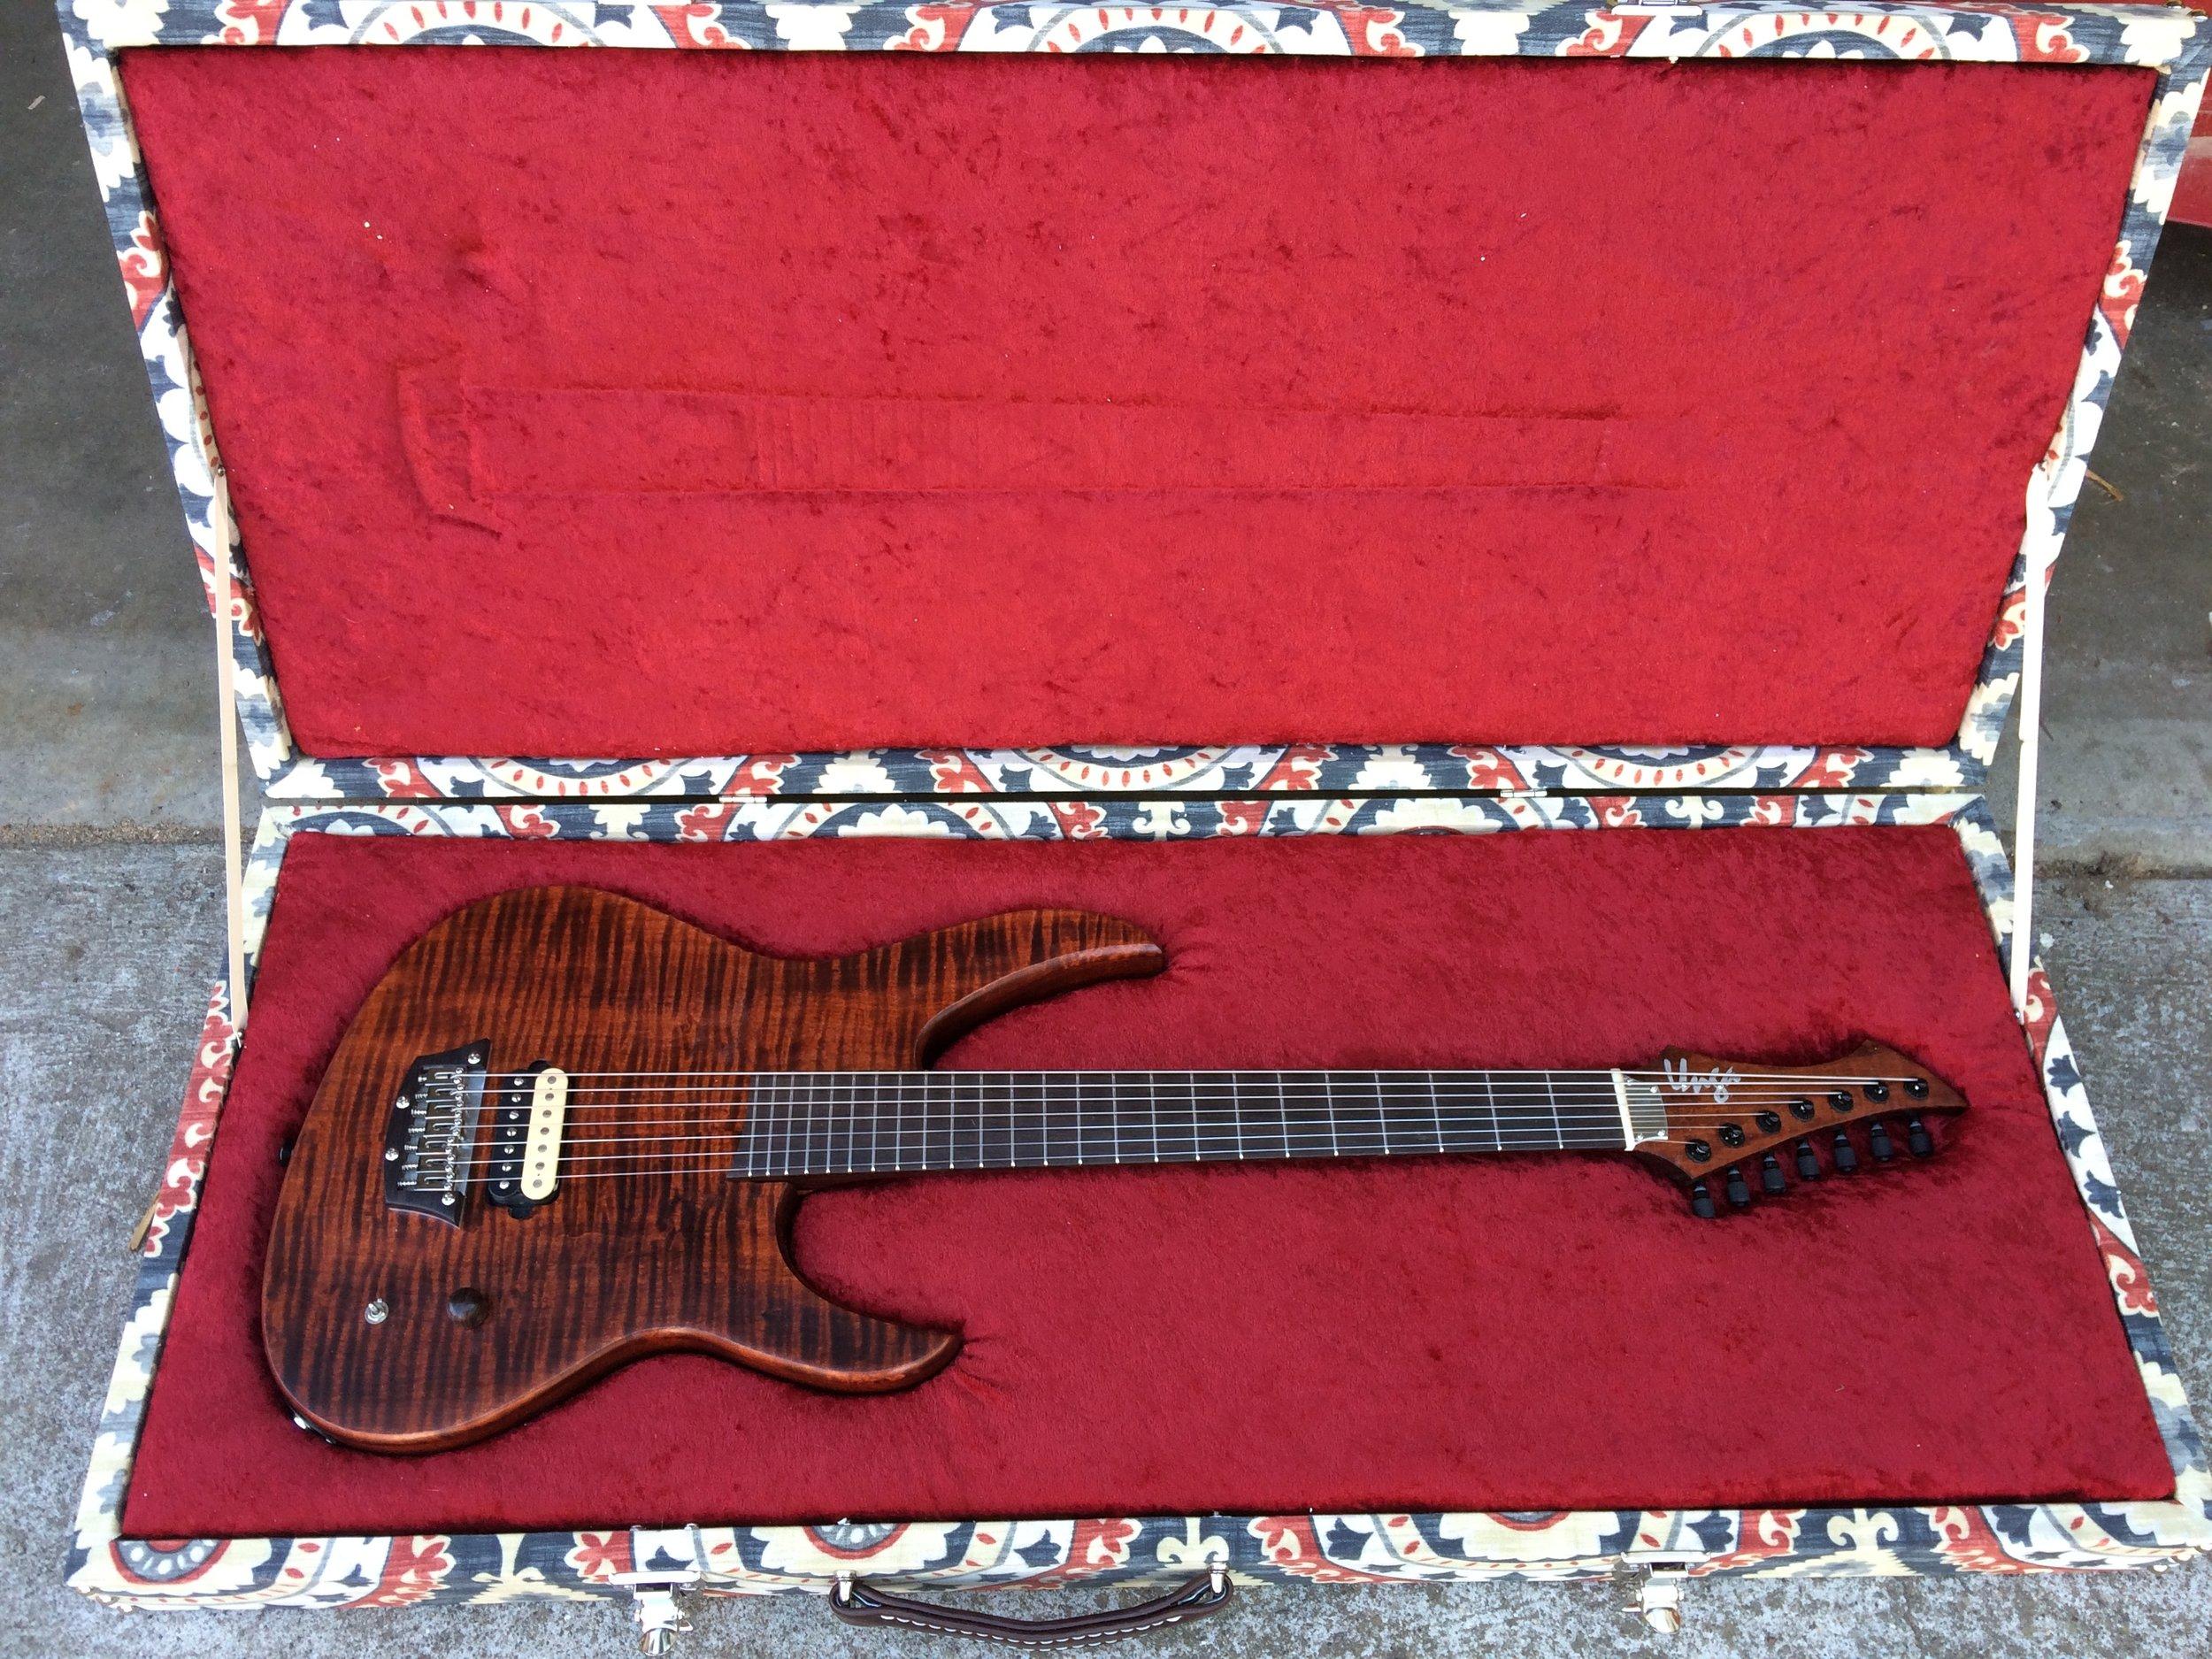 Chameleon #1 in its custom Unga Case